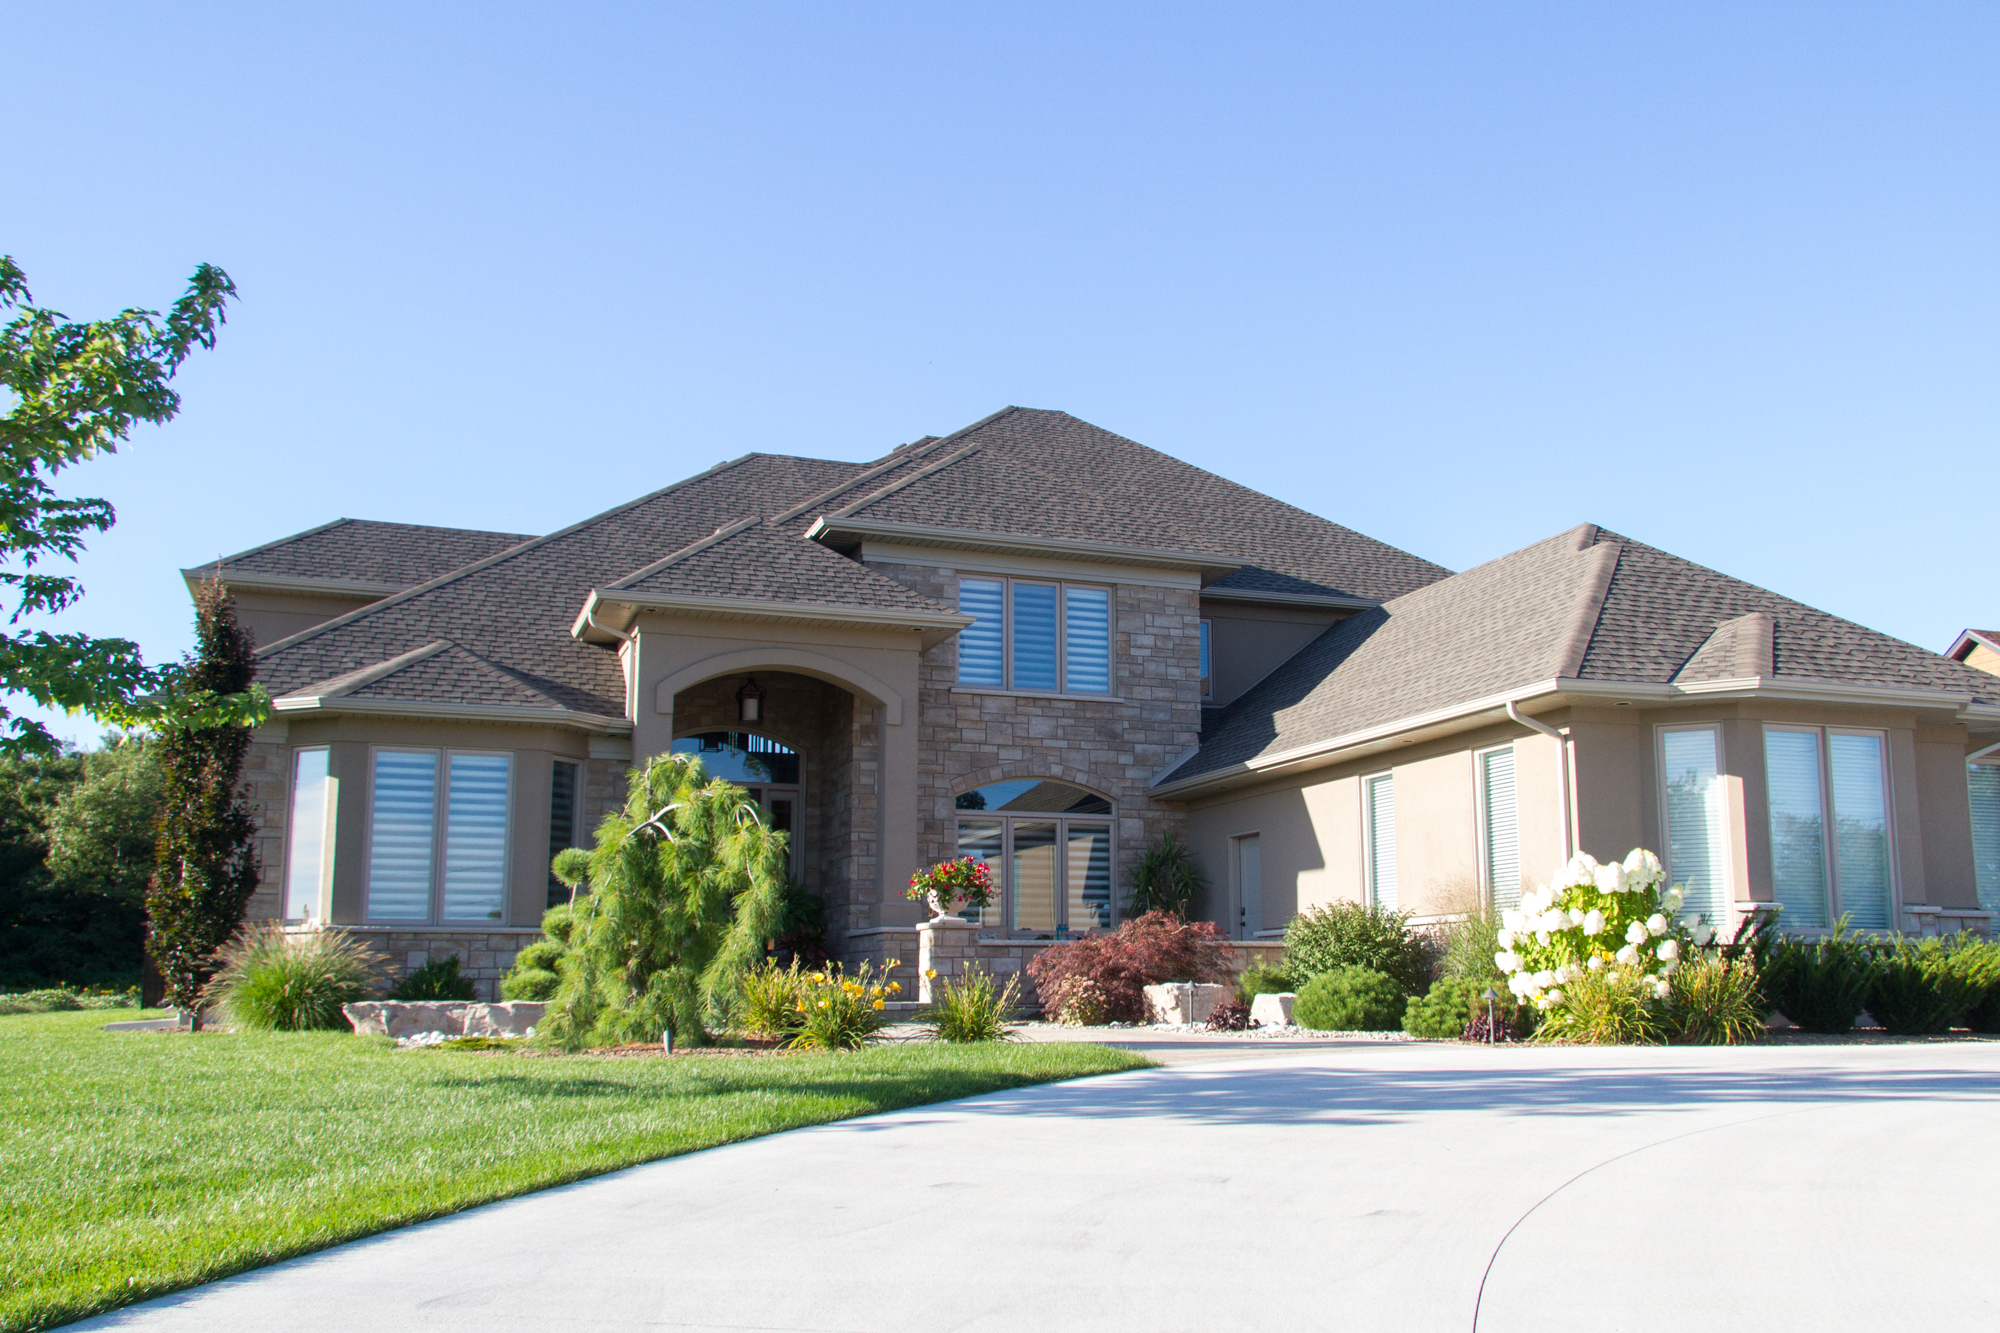 Home Design Inc: Interior Design By Falcone